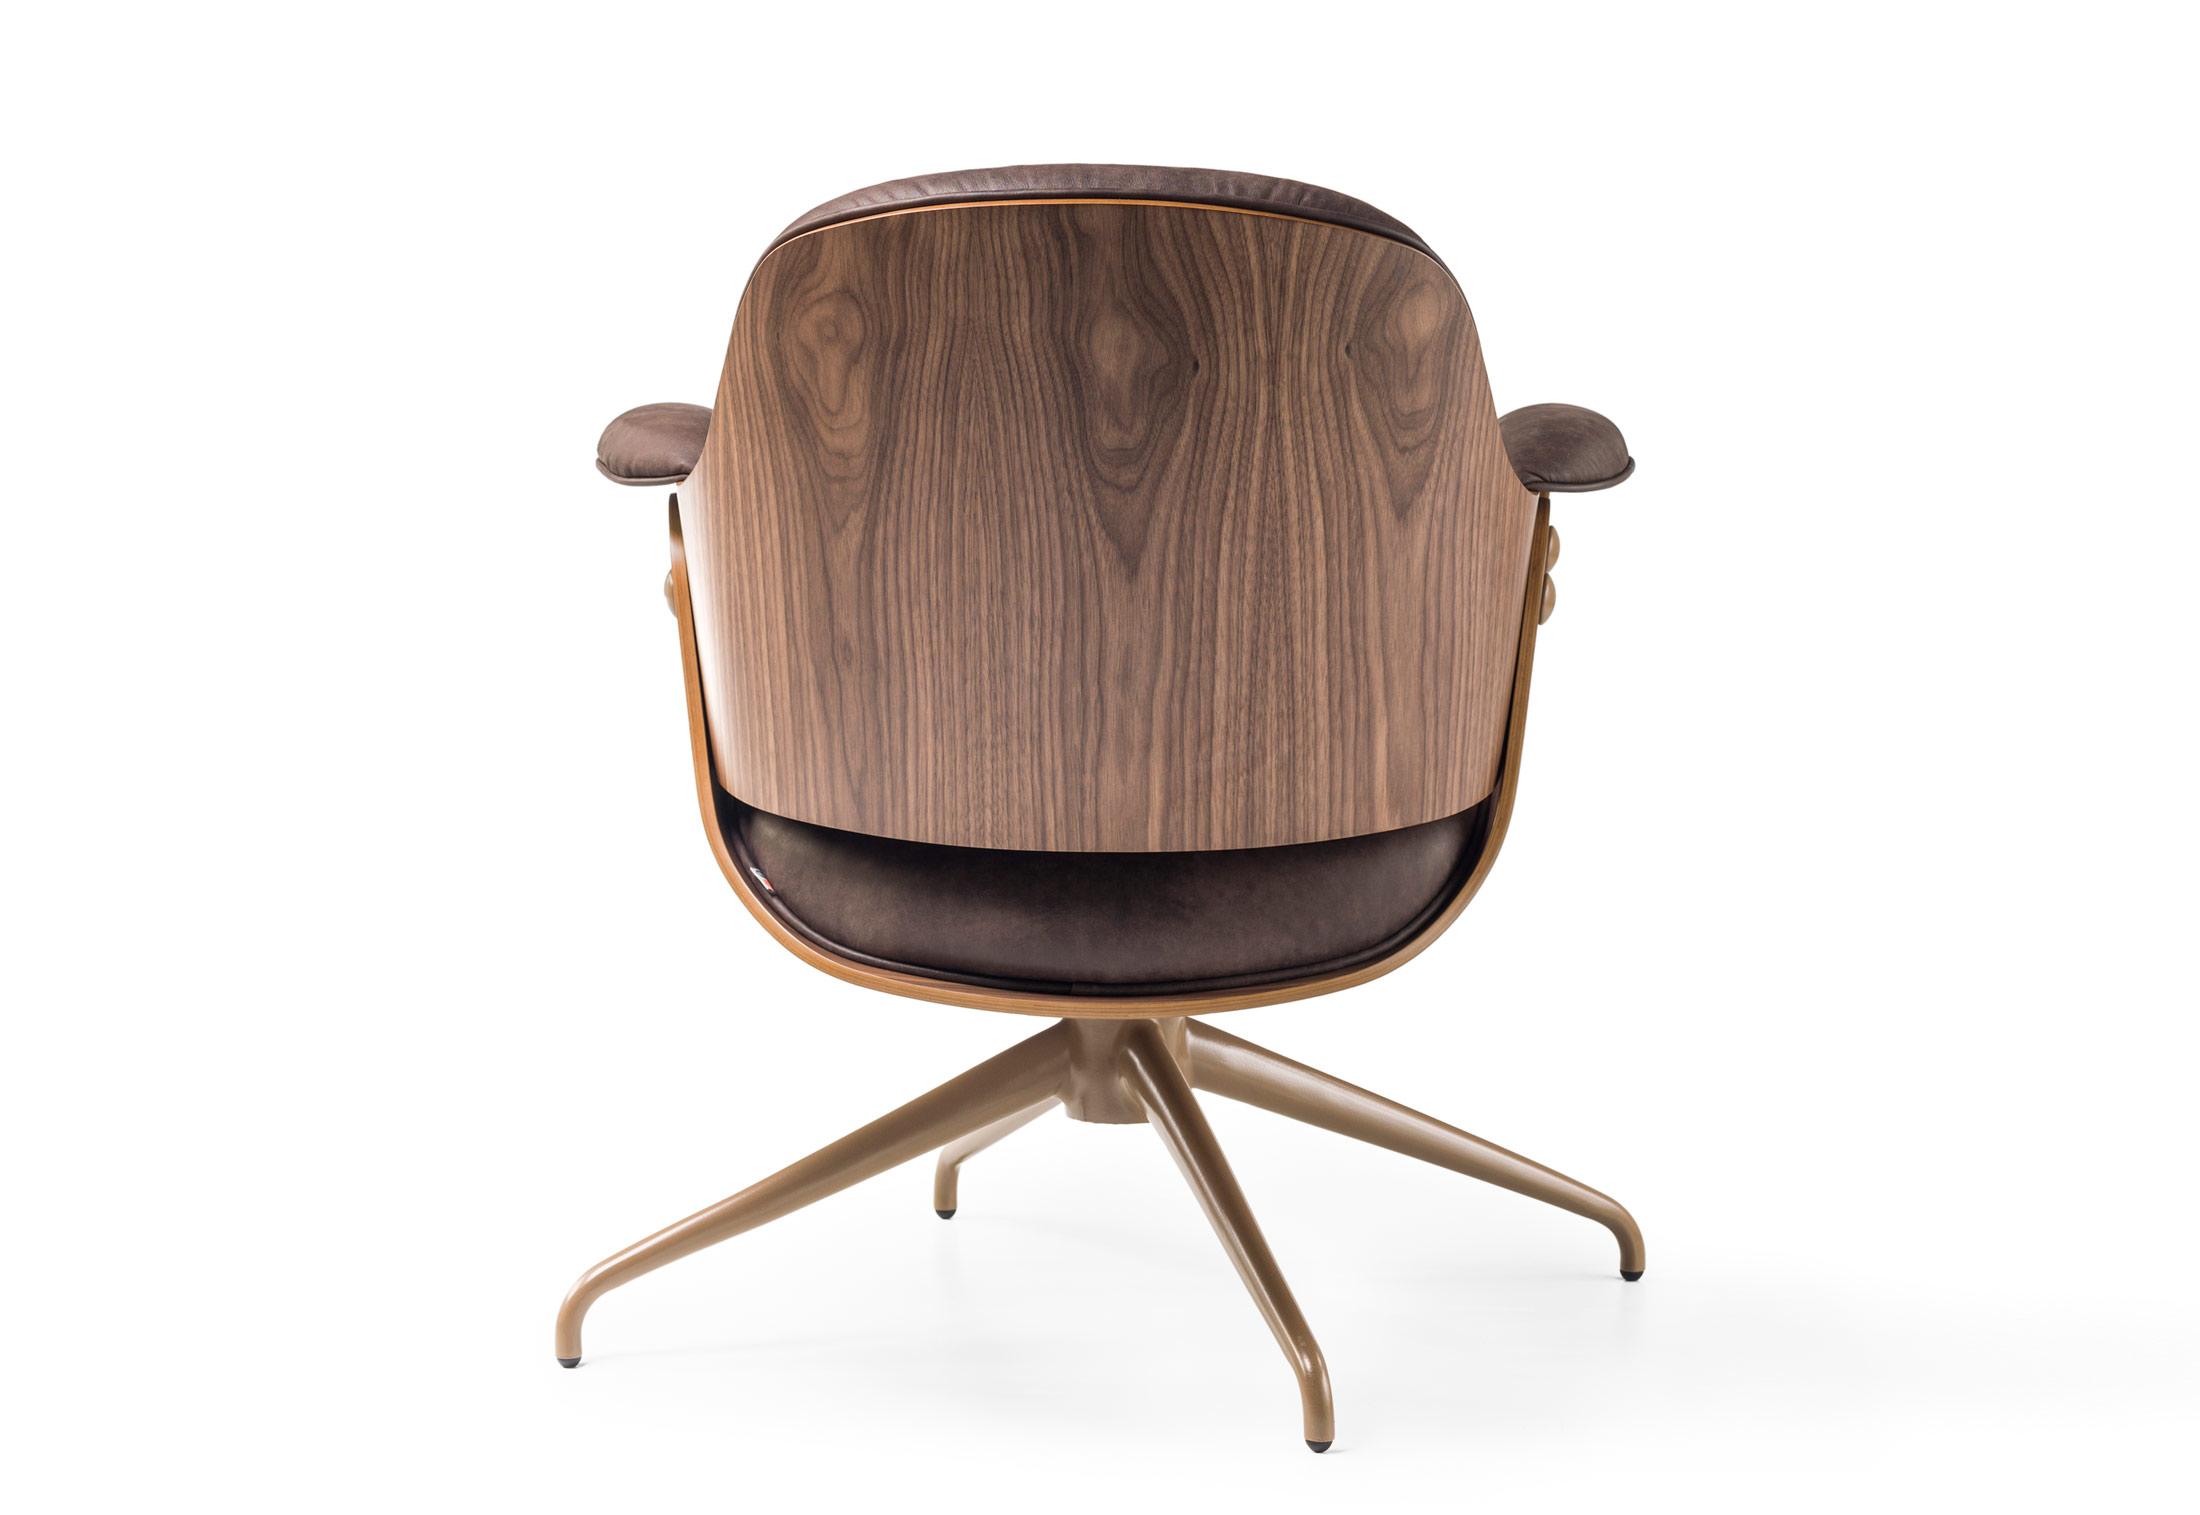 Prime Low Lounger Swivel By Bd Barcelona Design Stylepark Creativecarmelina Interior Chair Design Creativecarmelinacom